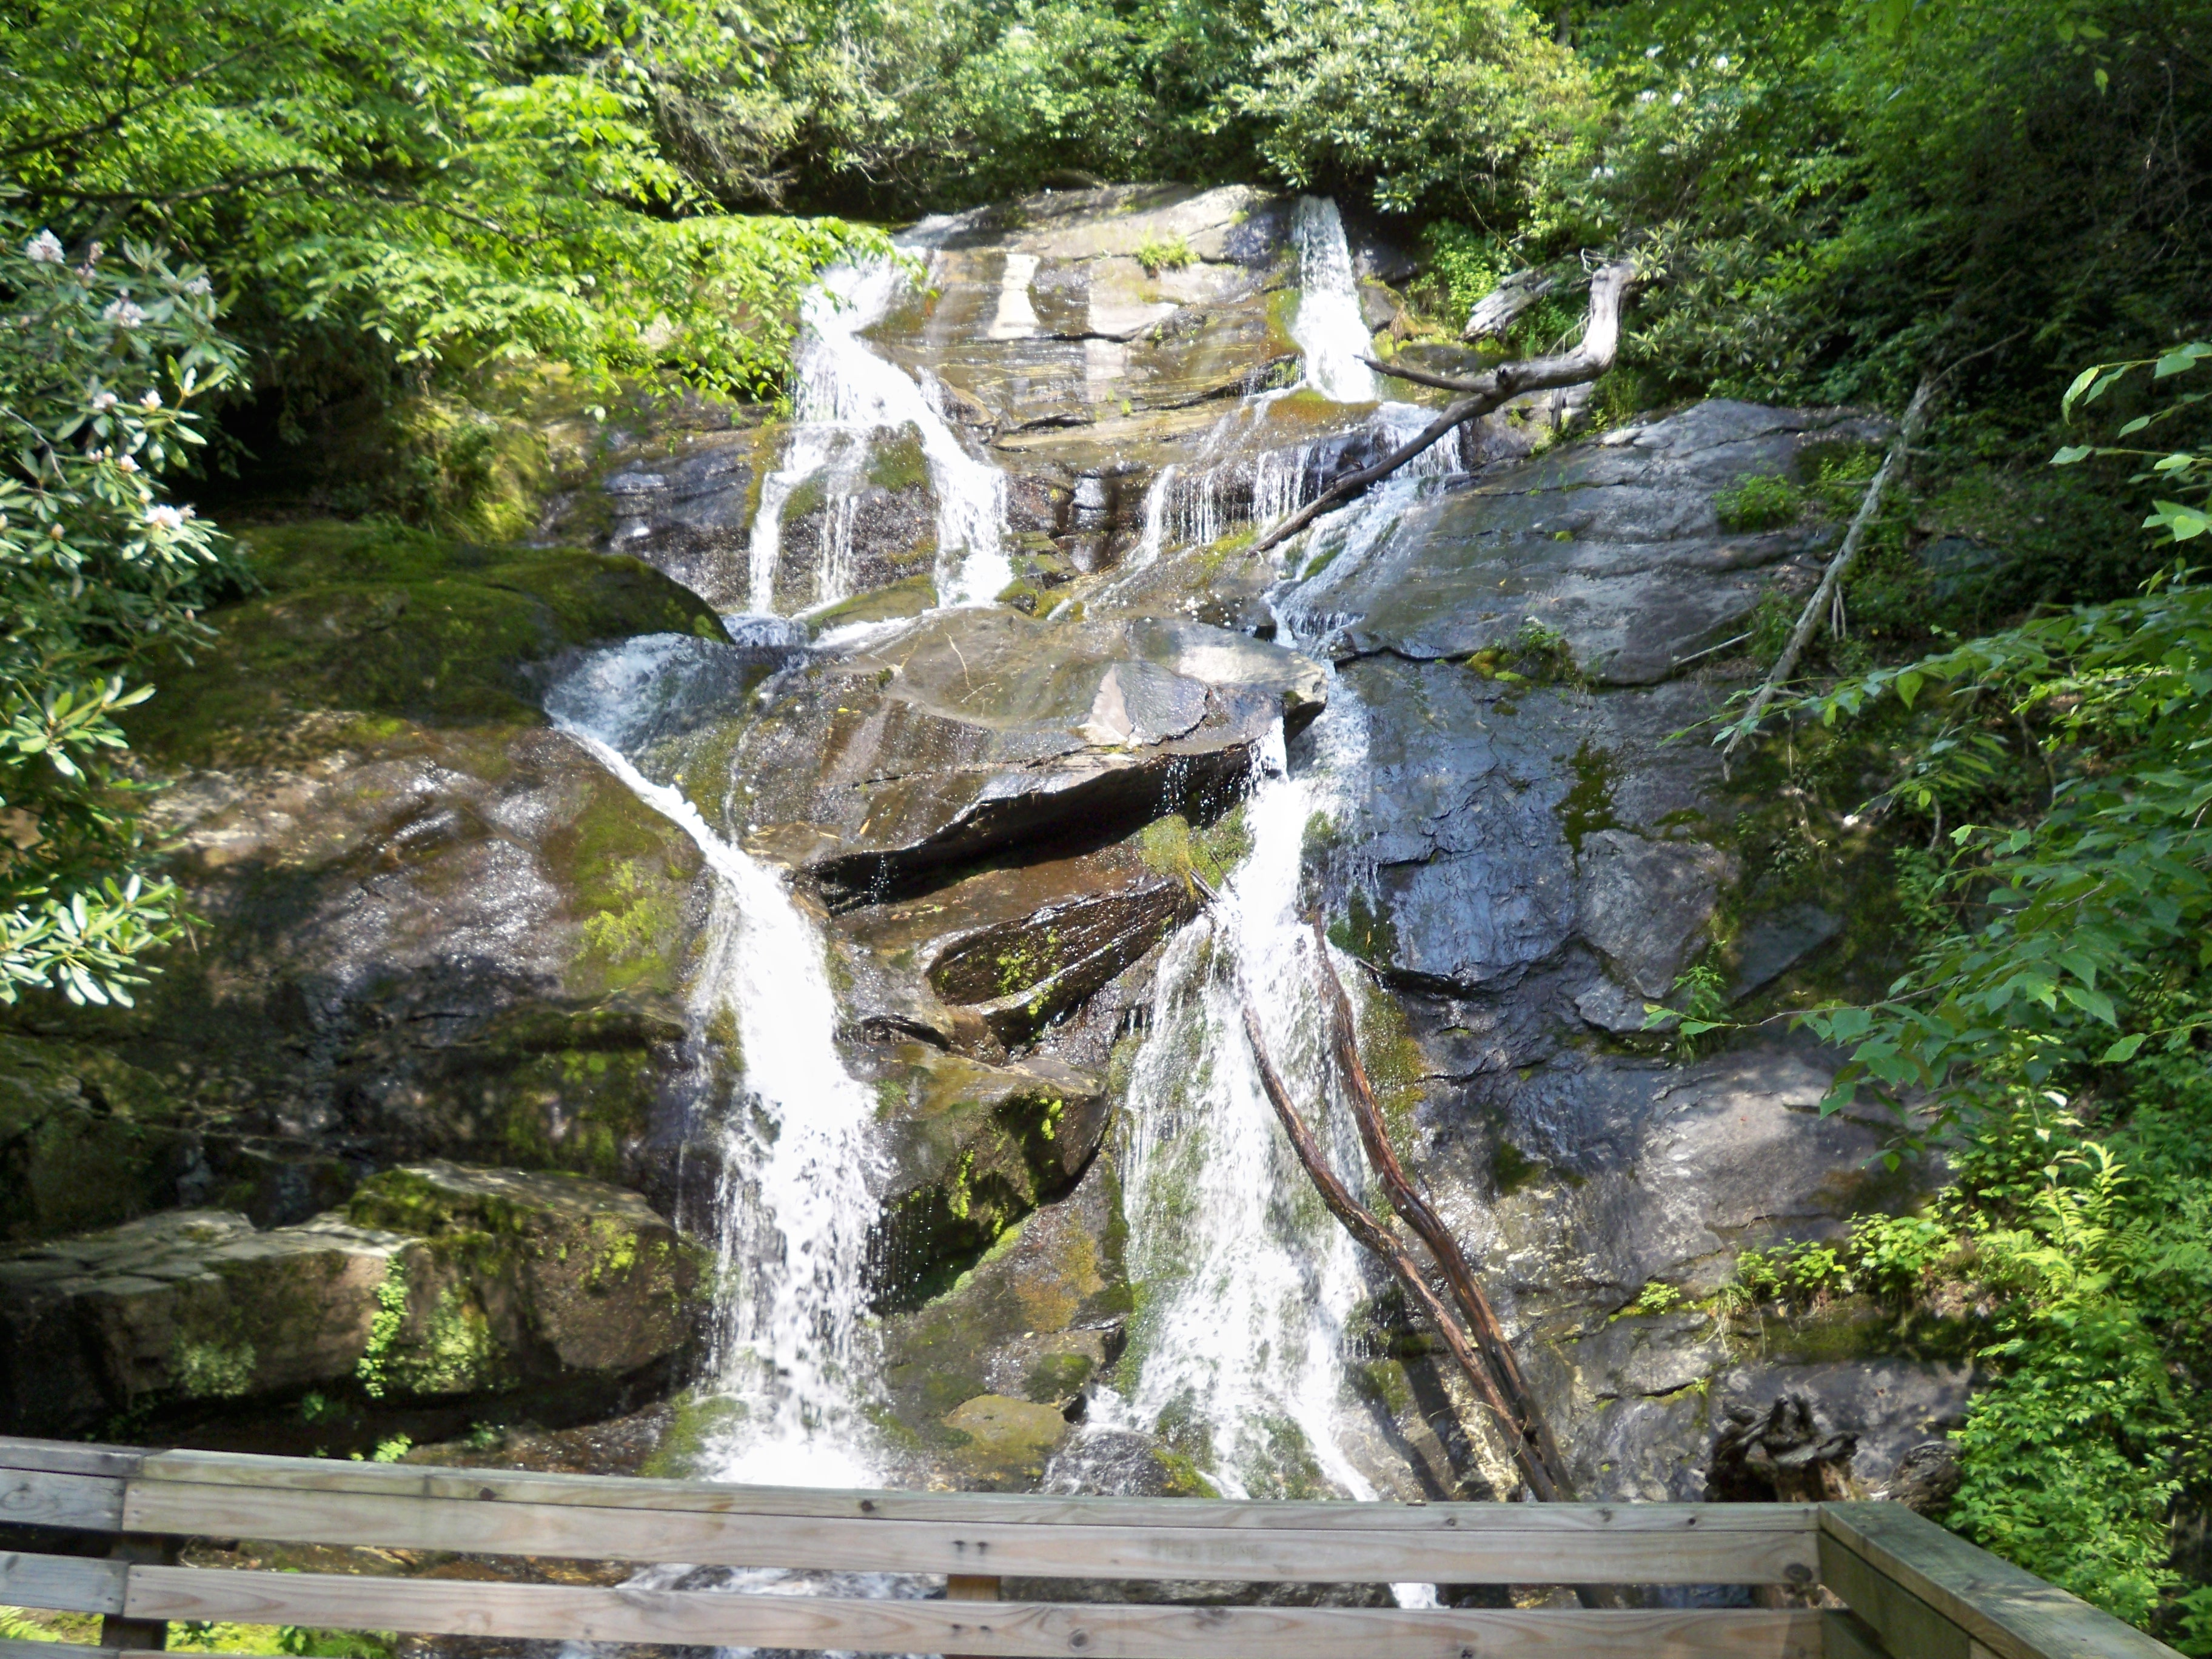 Ammons Falls